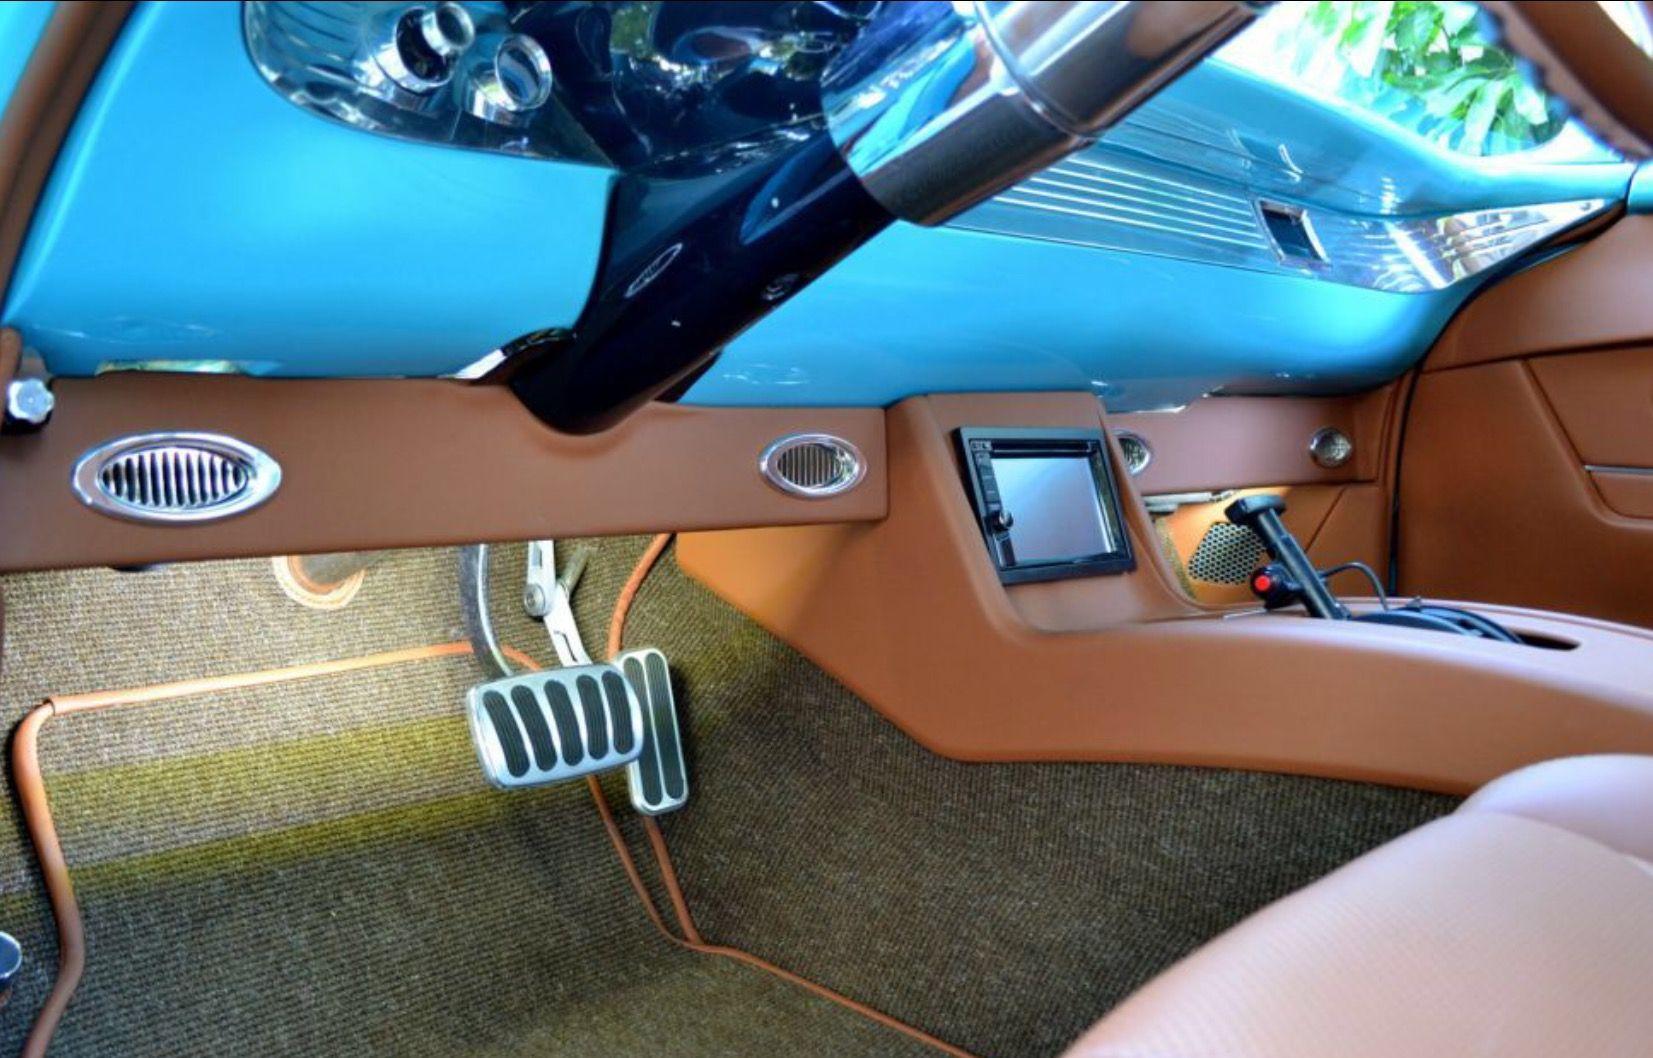 Pin by Ken Vander Putten on 57 Chevy Custom center